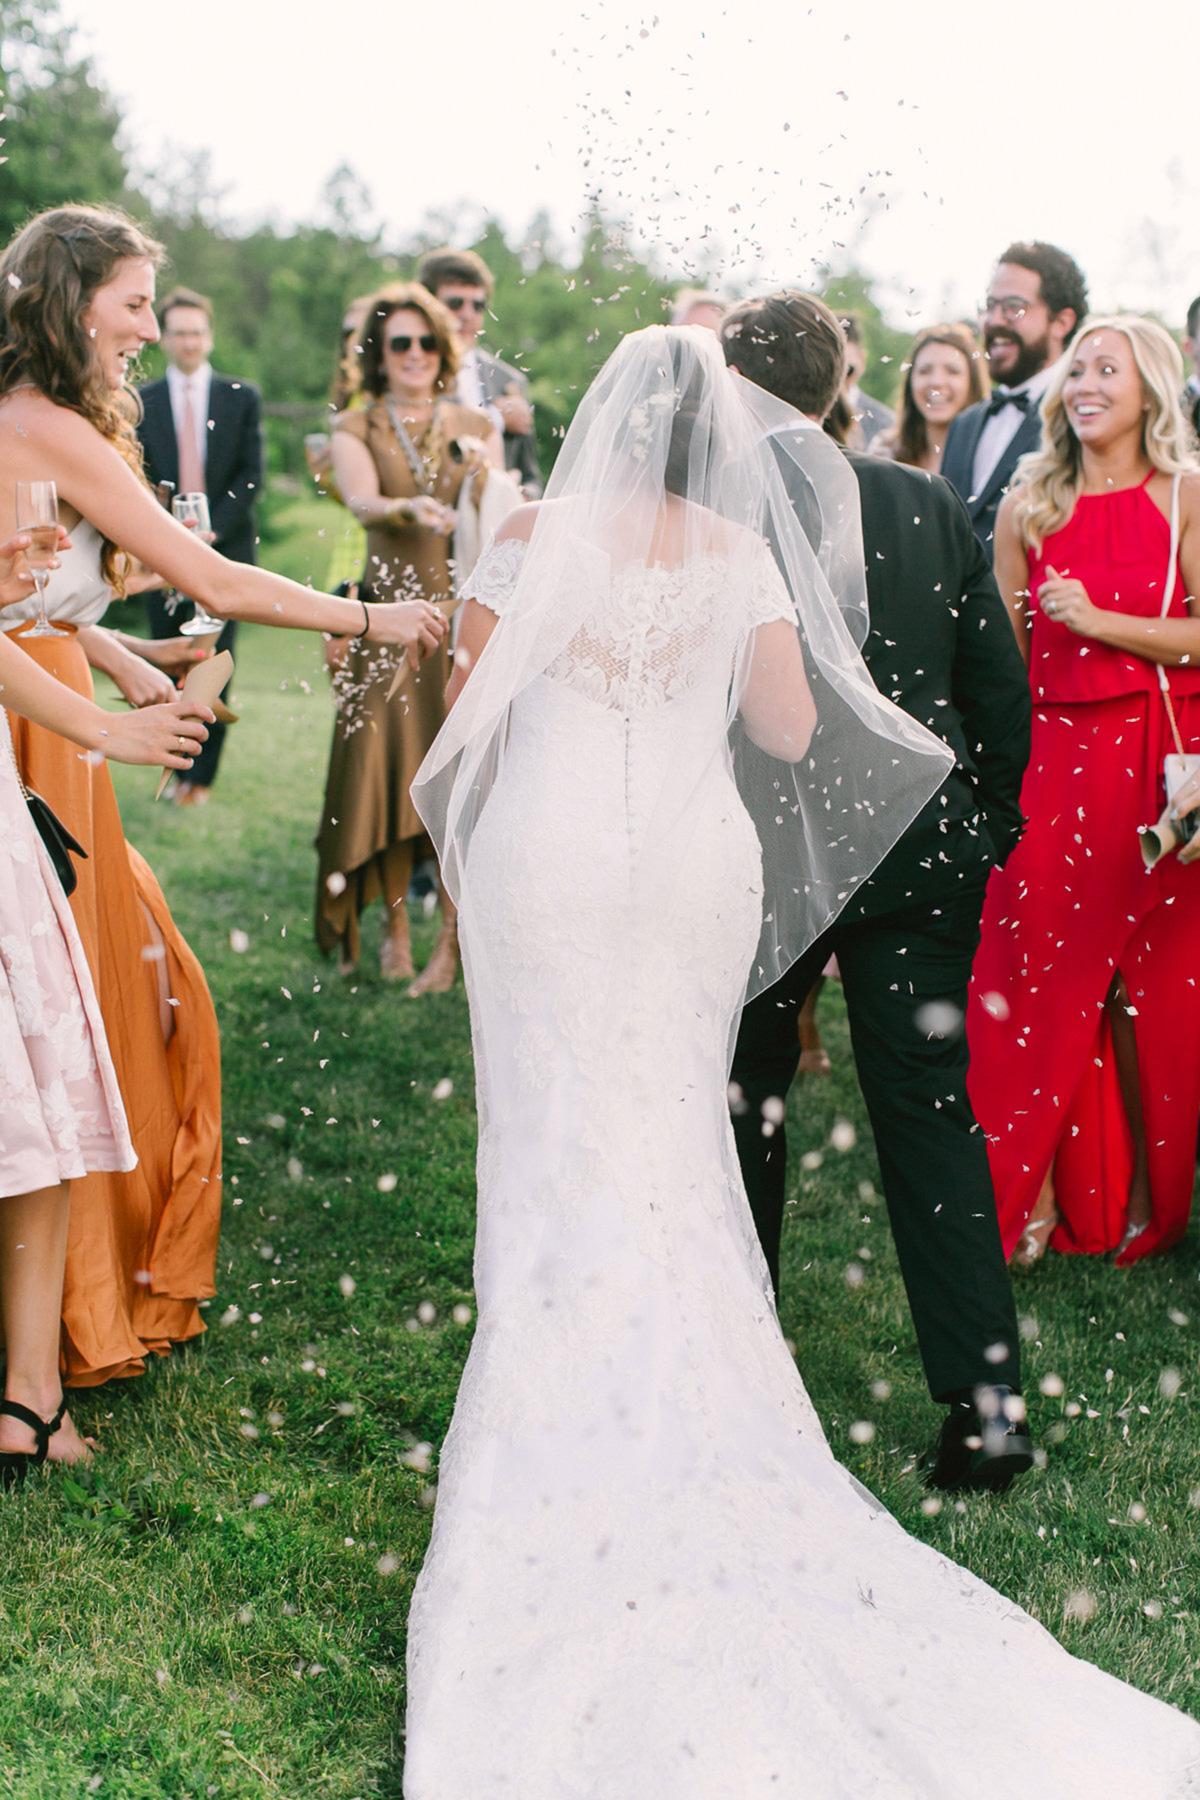 artiese-studios-vineyard-bride-swish-list-private-estate-cambridge-wedding-6.jpg